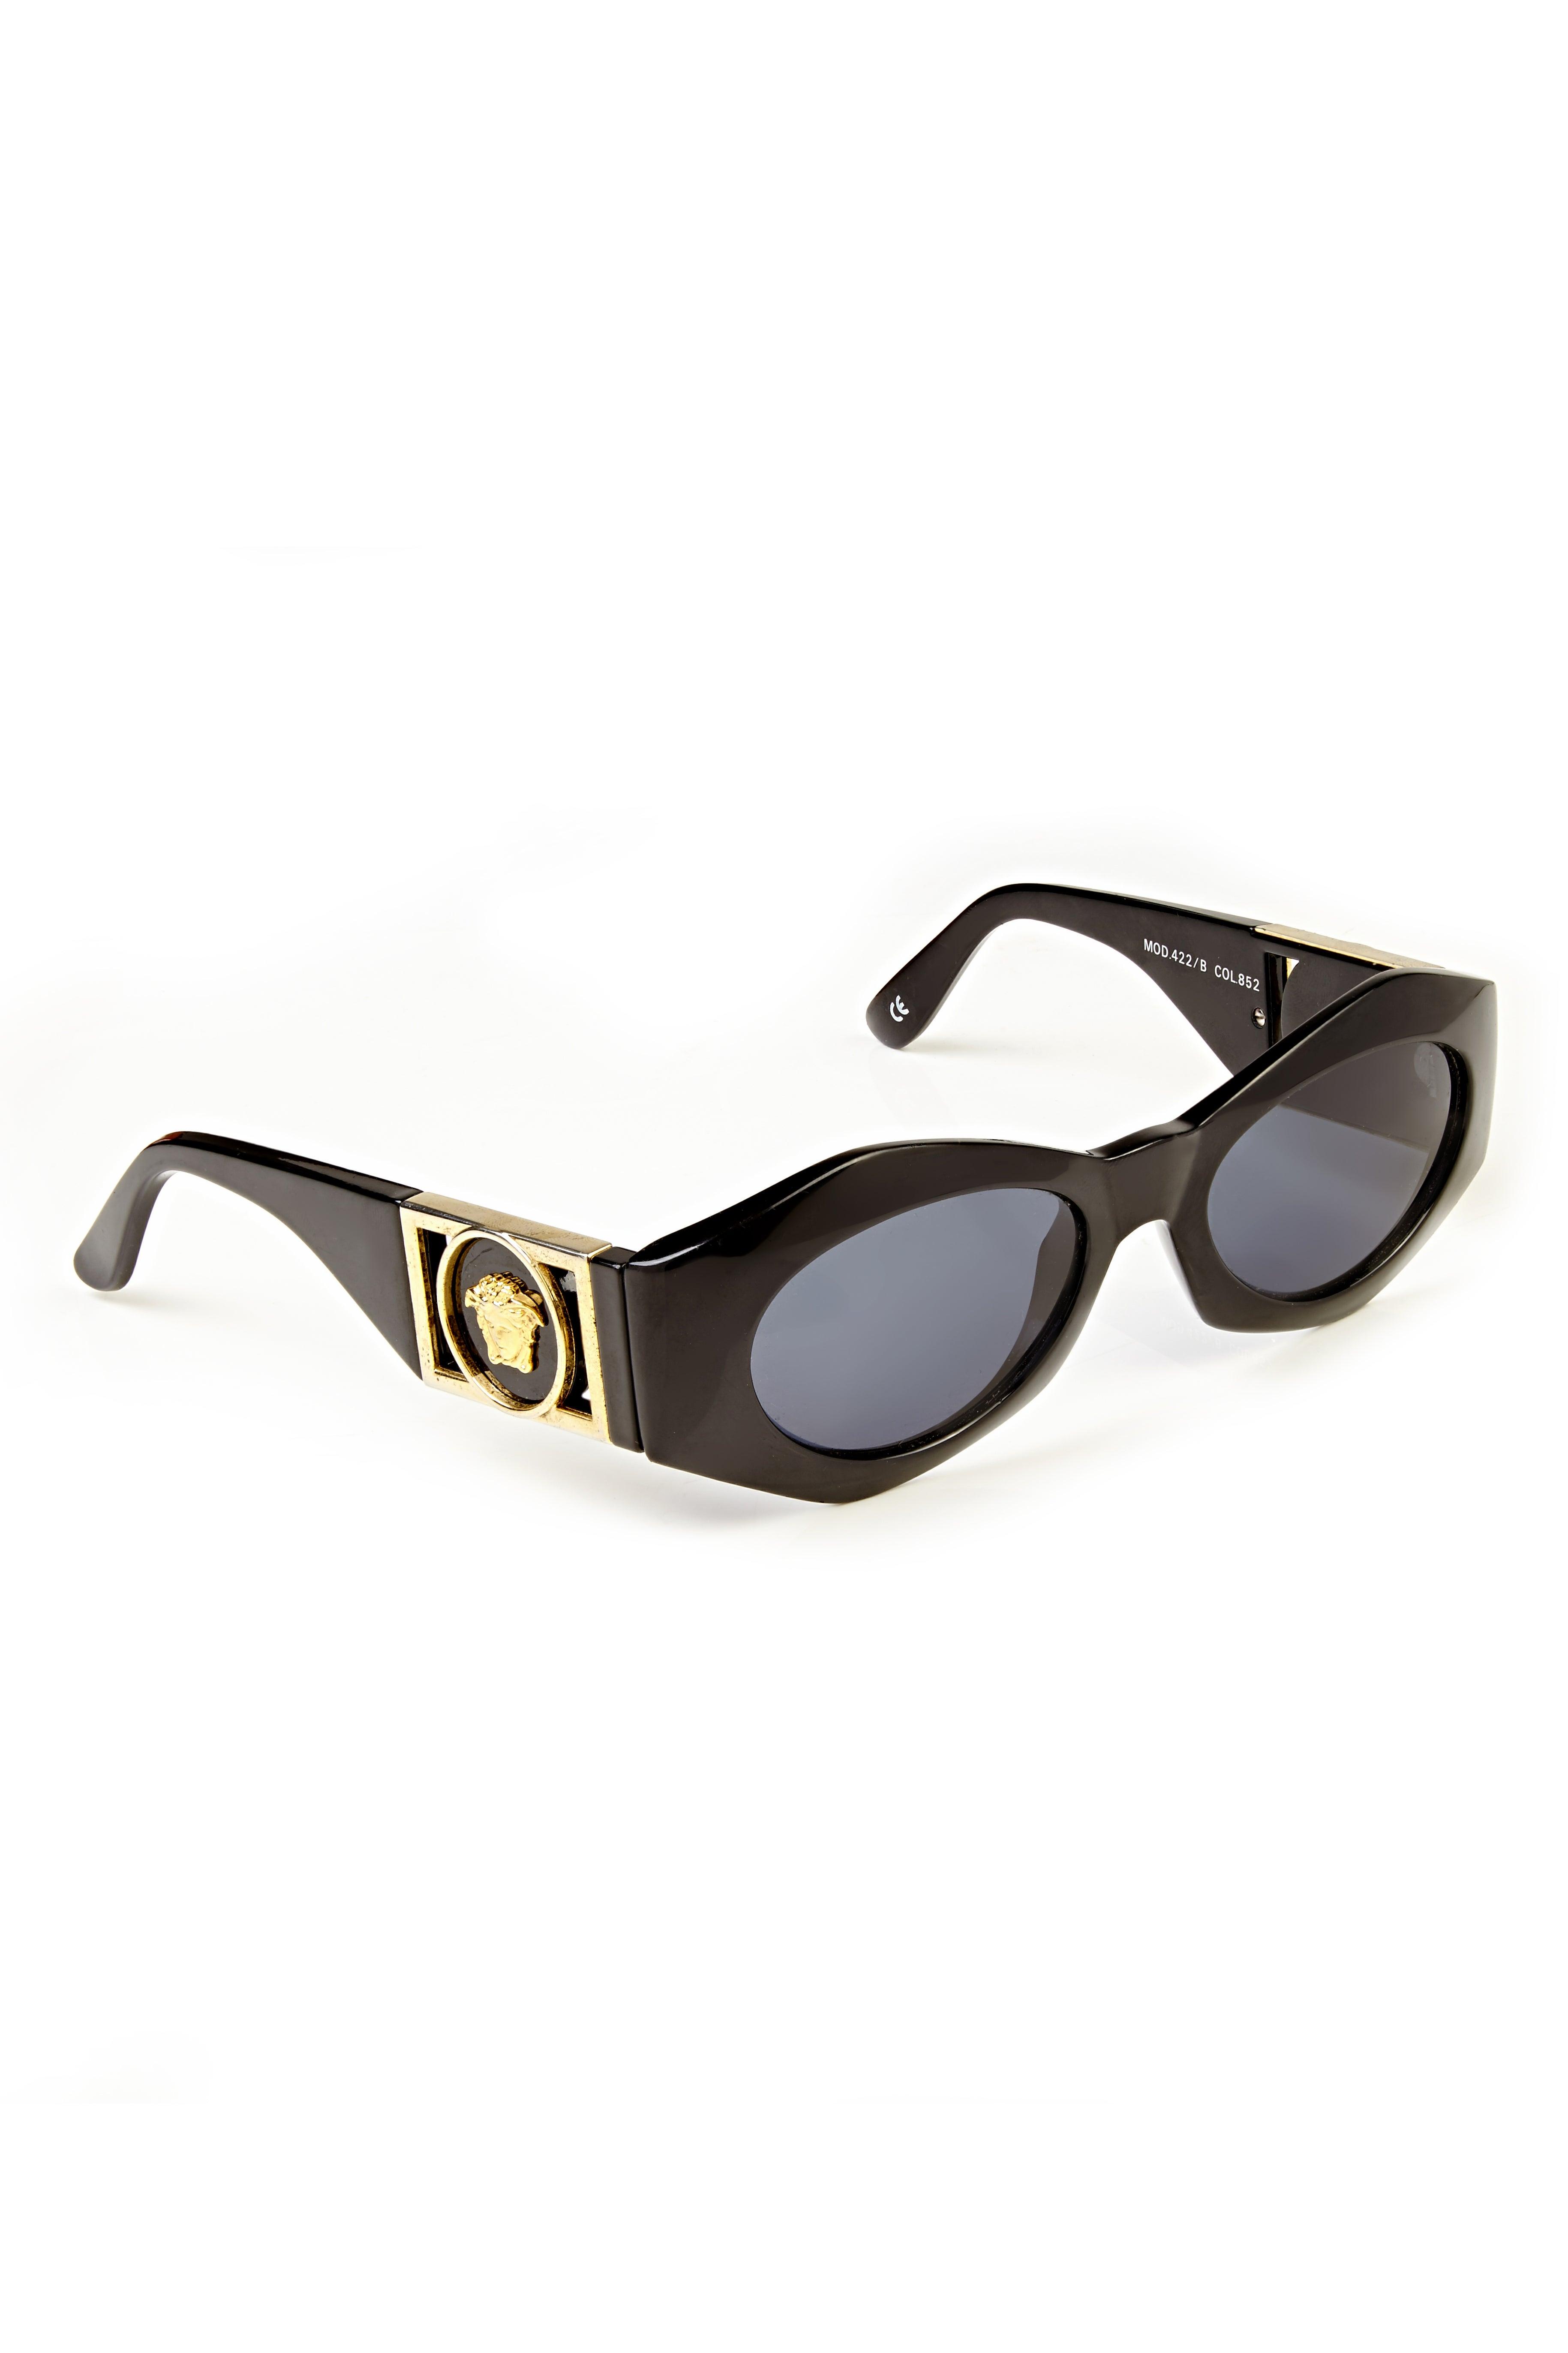 2e847c3f29 1990s Gianni Versace Black Medusa Vintage Sunglasses with Case Mod 422 Col  852 at 1stdibs